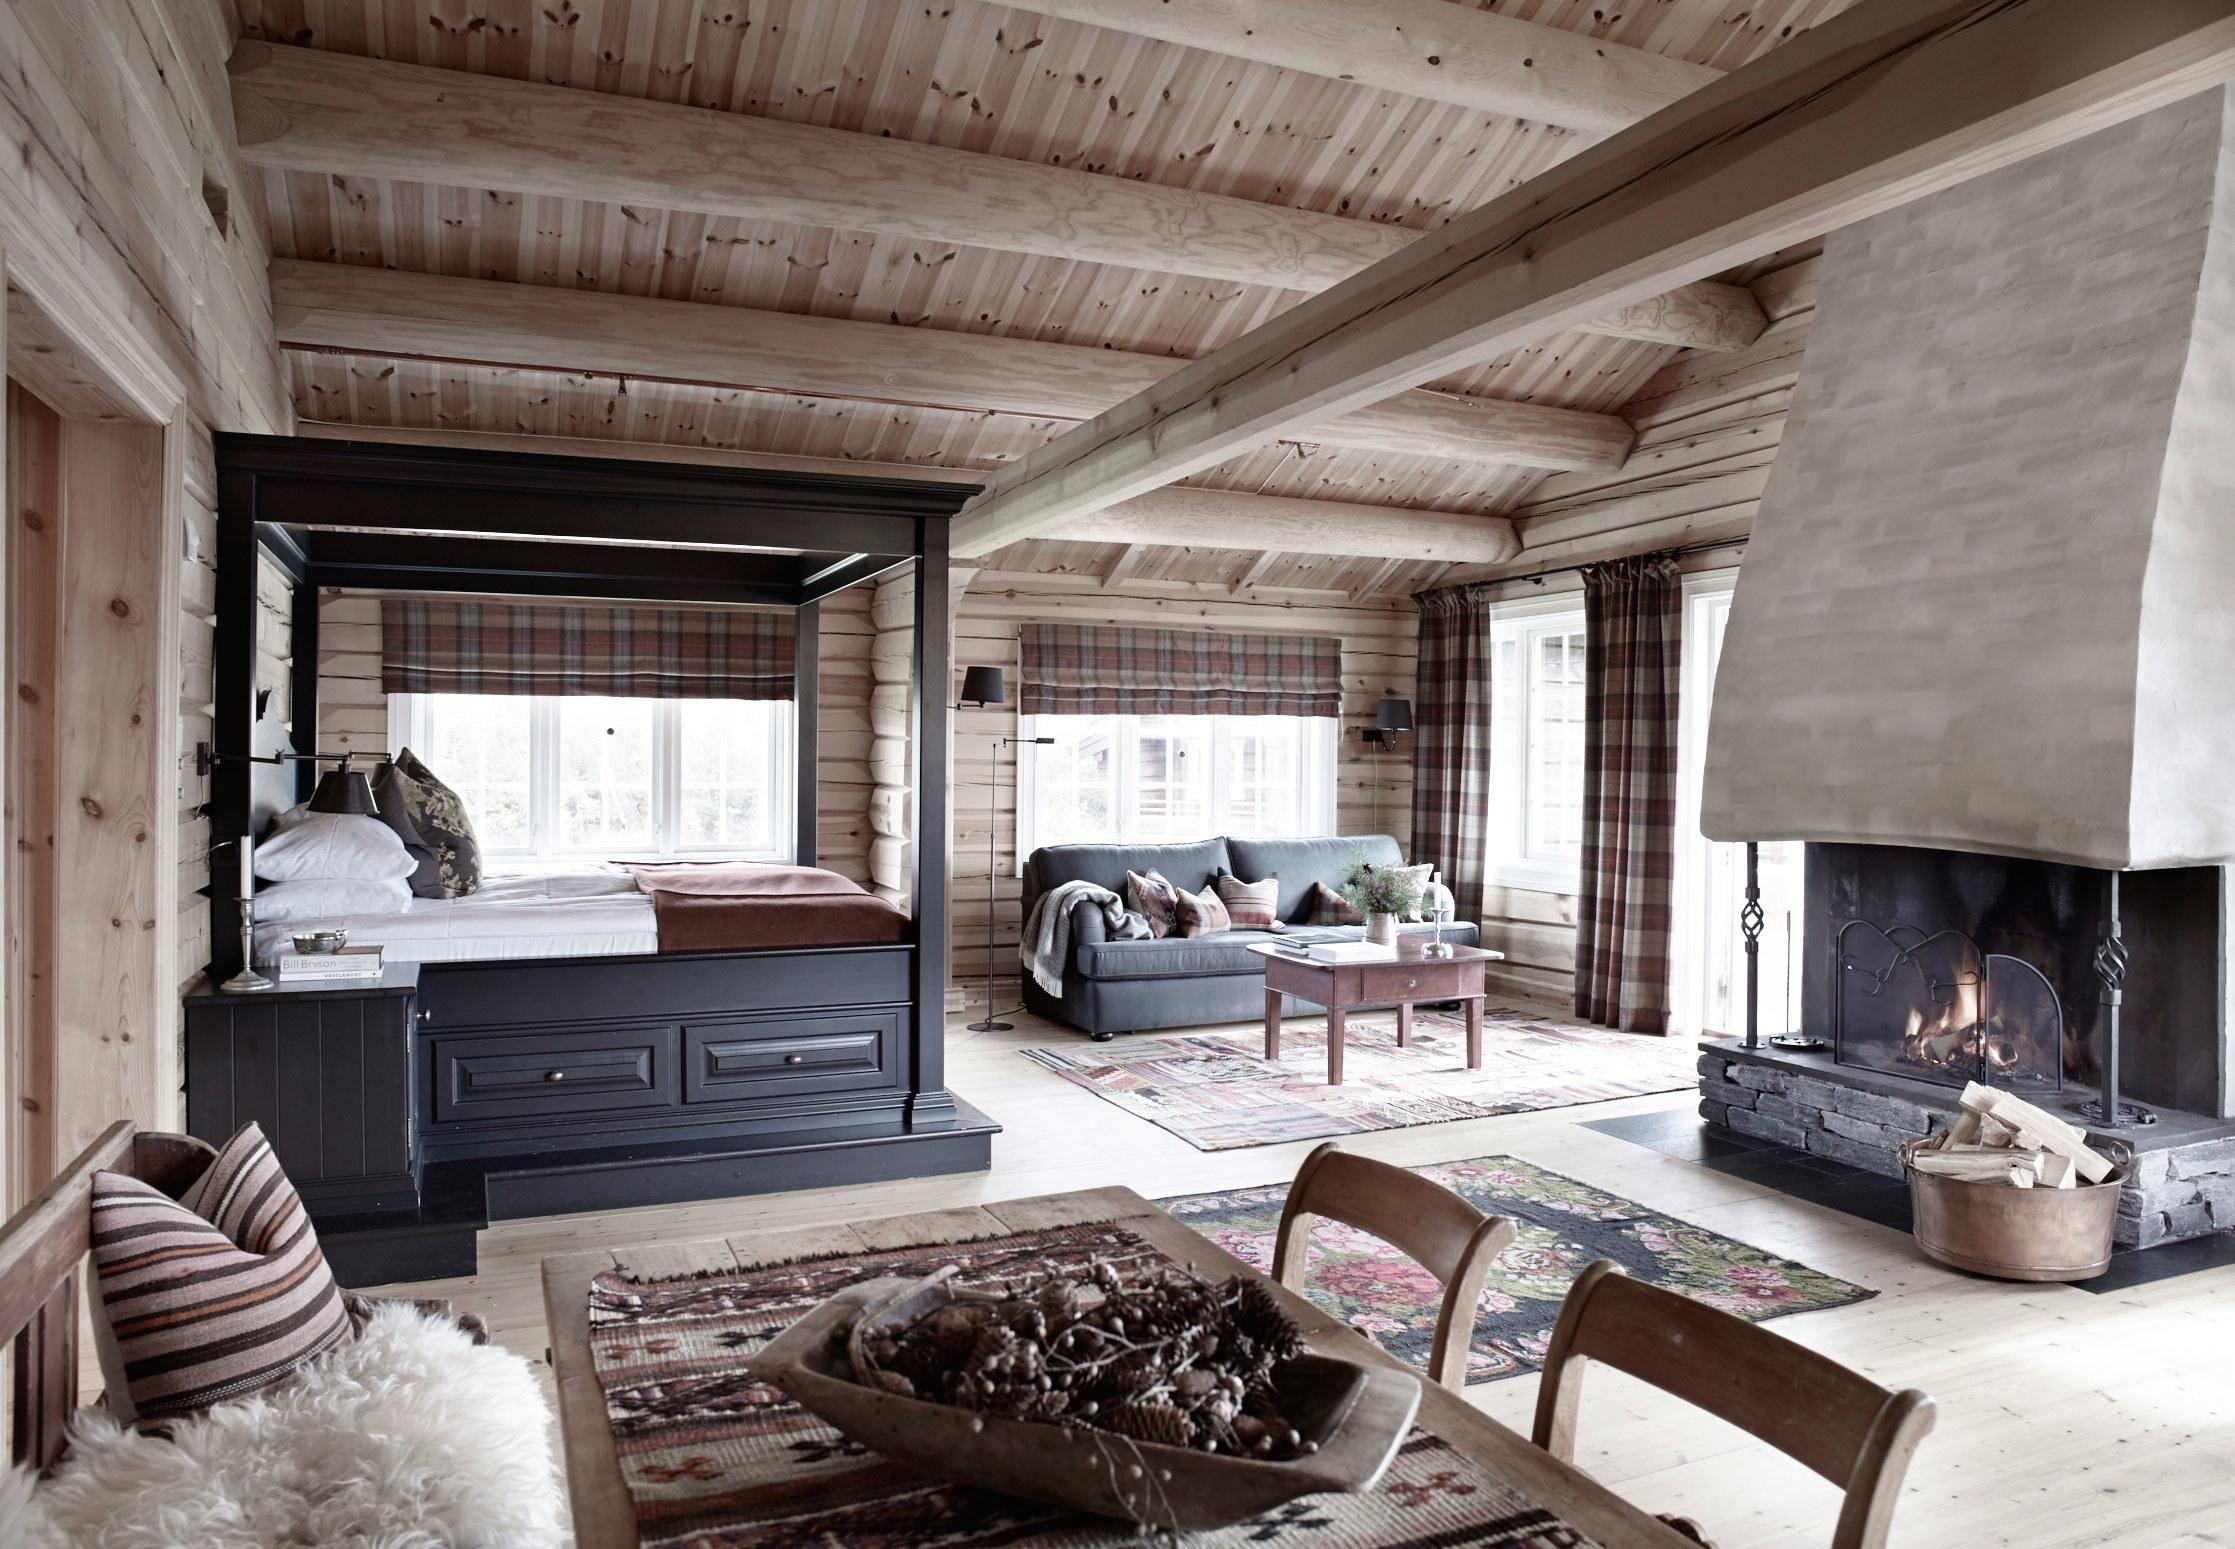 Best Norway Fjord Hotels Beautiful